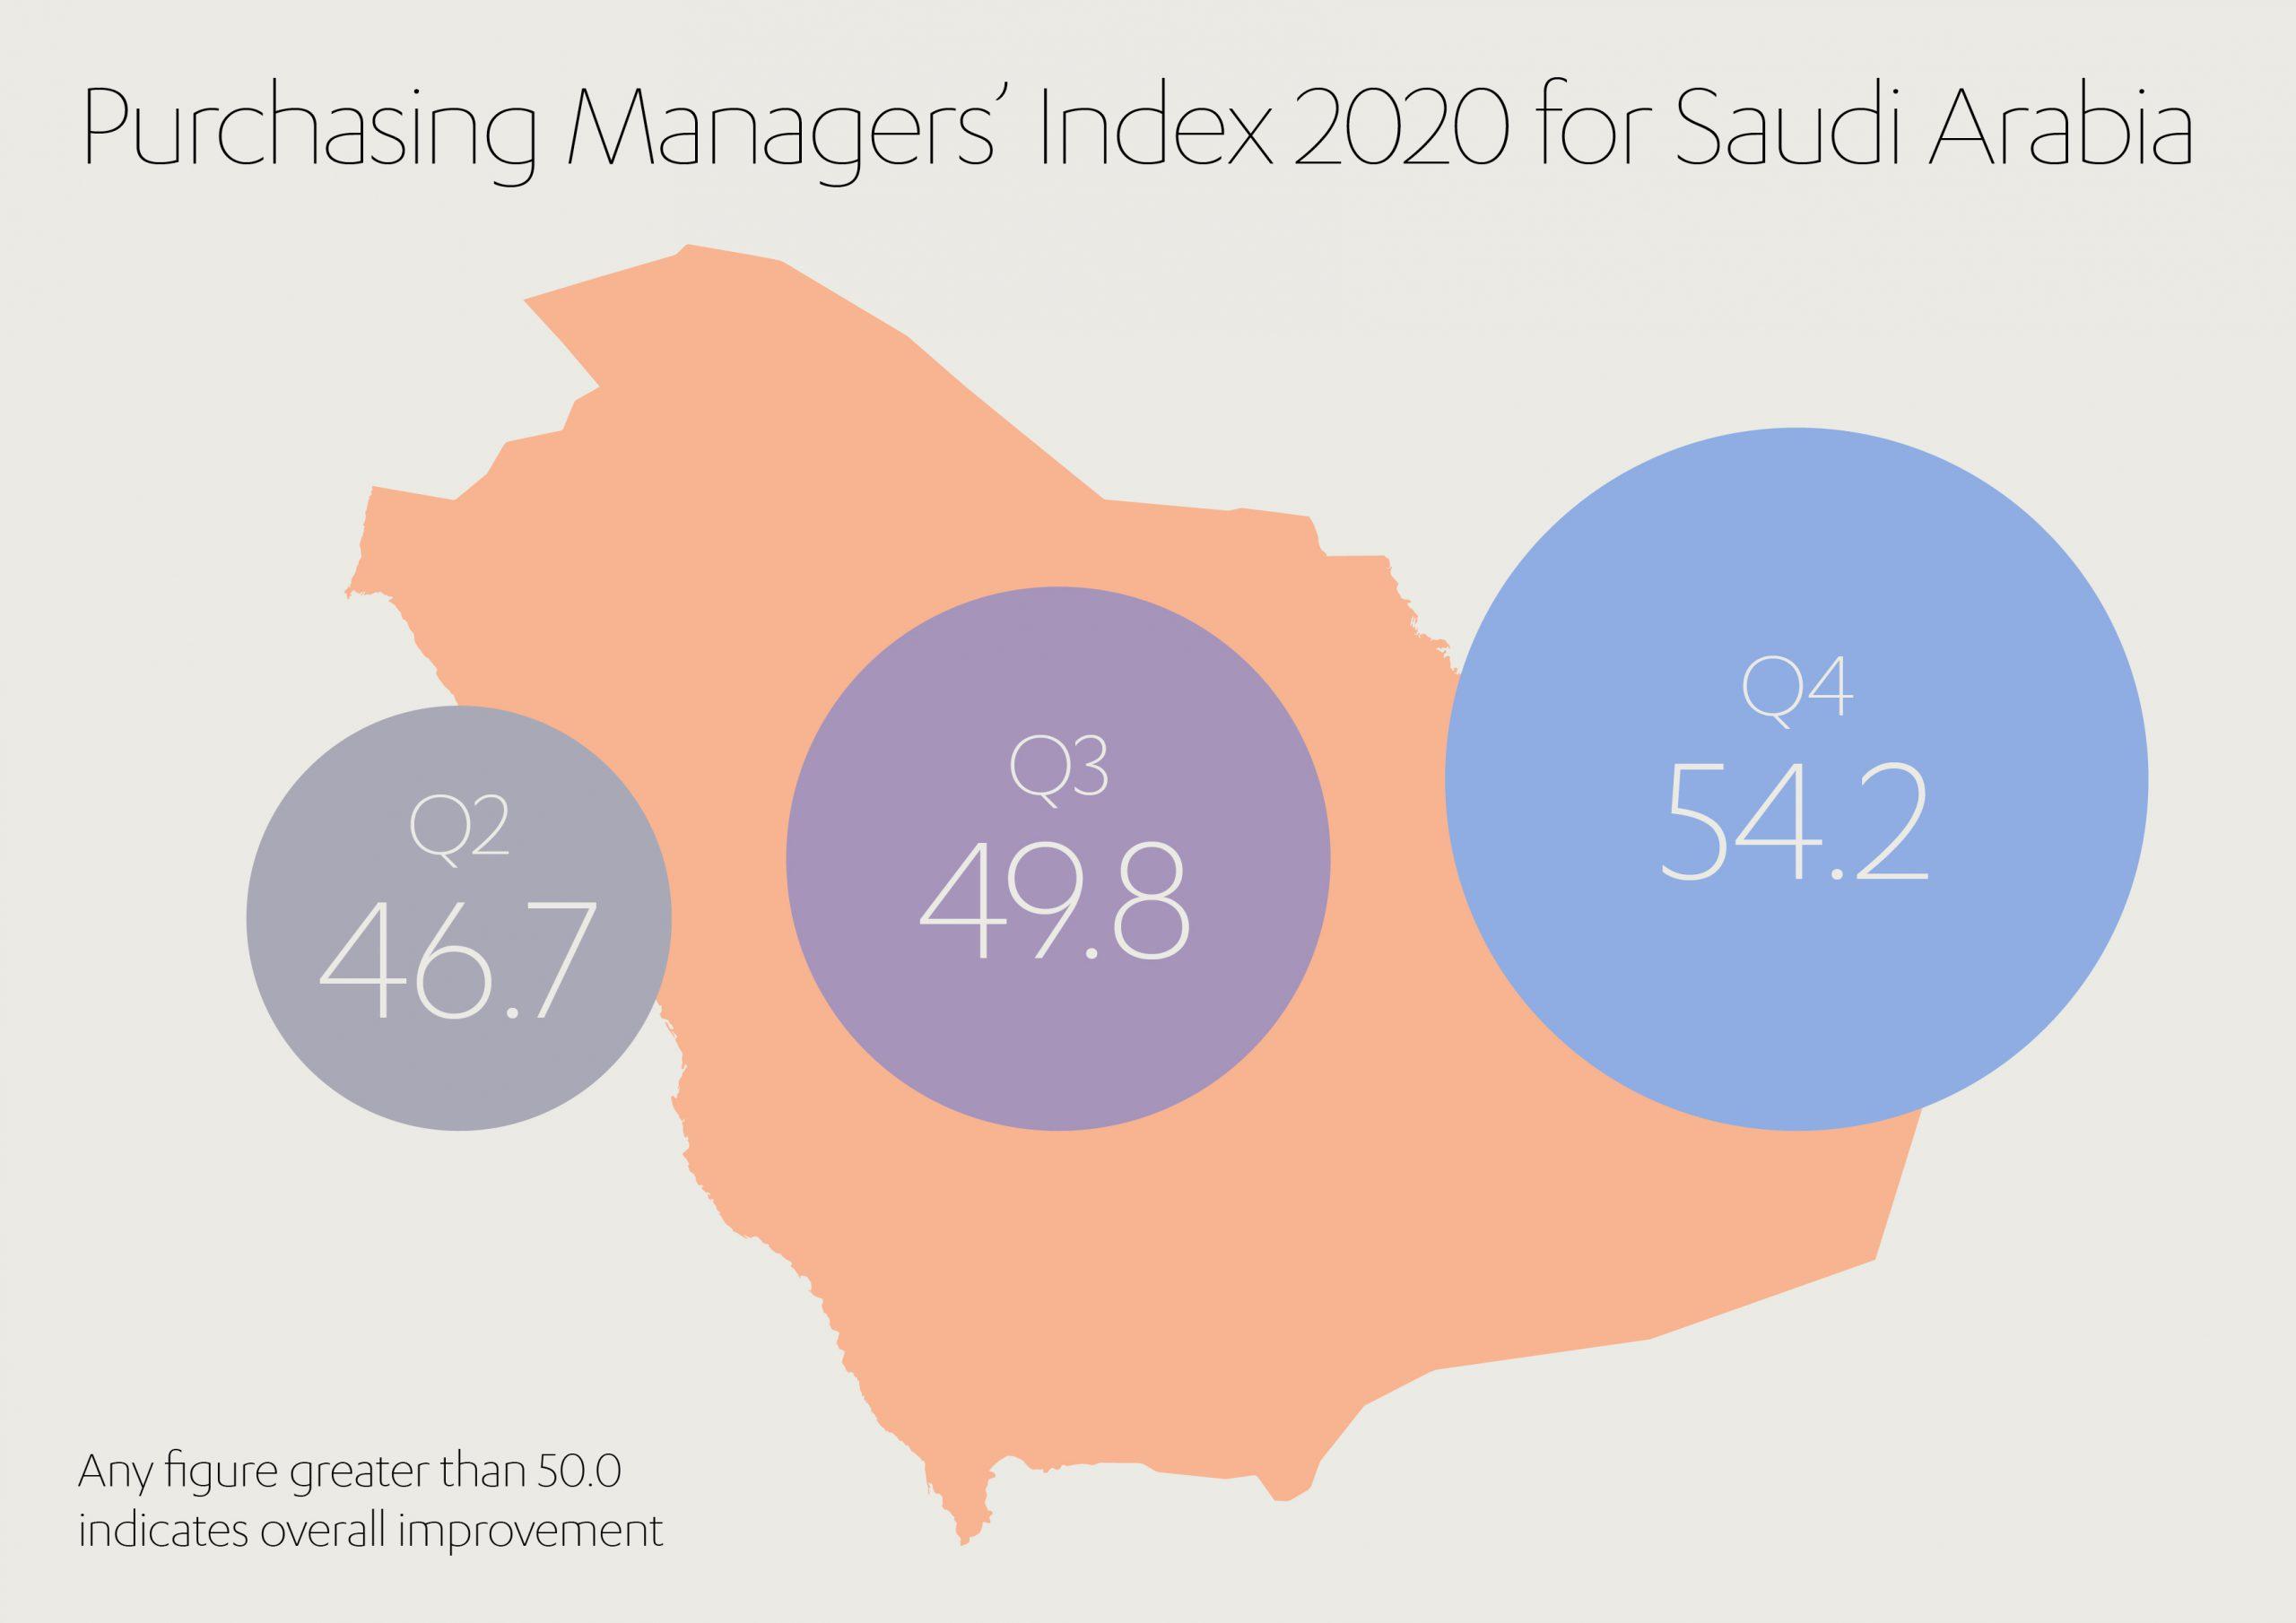 Saudi Purchasing Managers Index